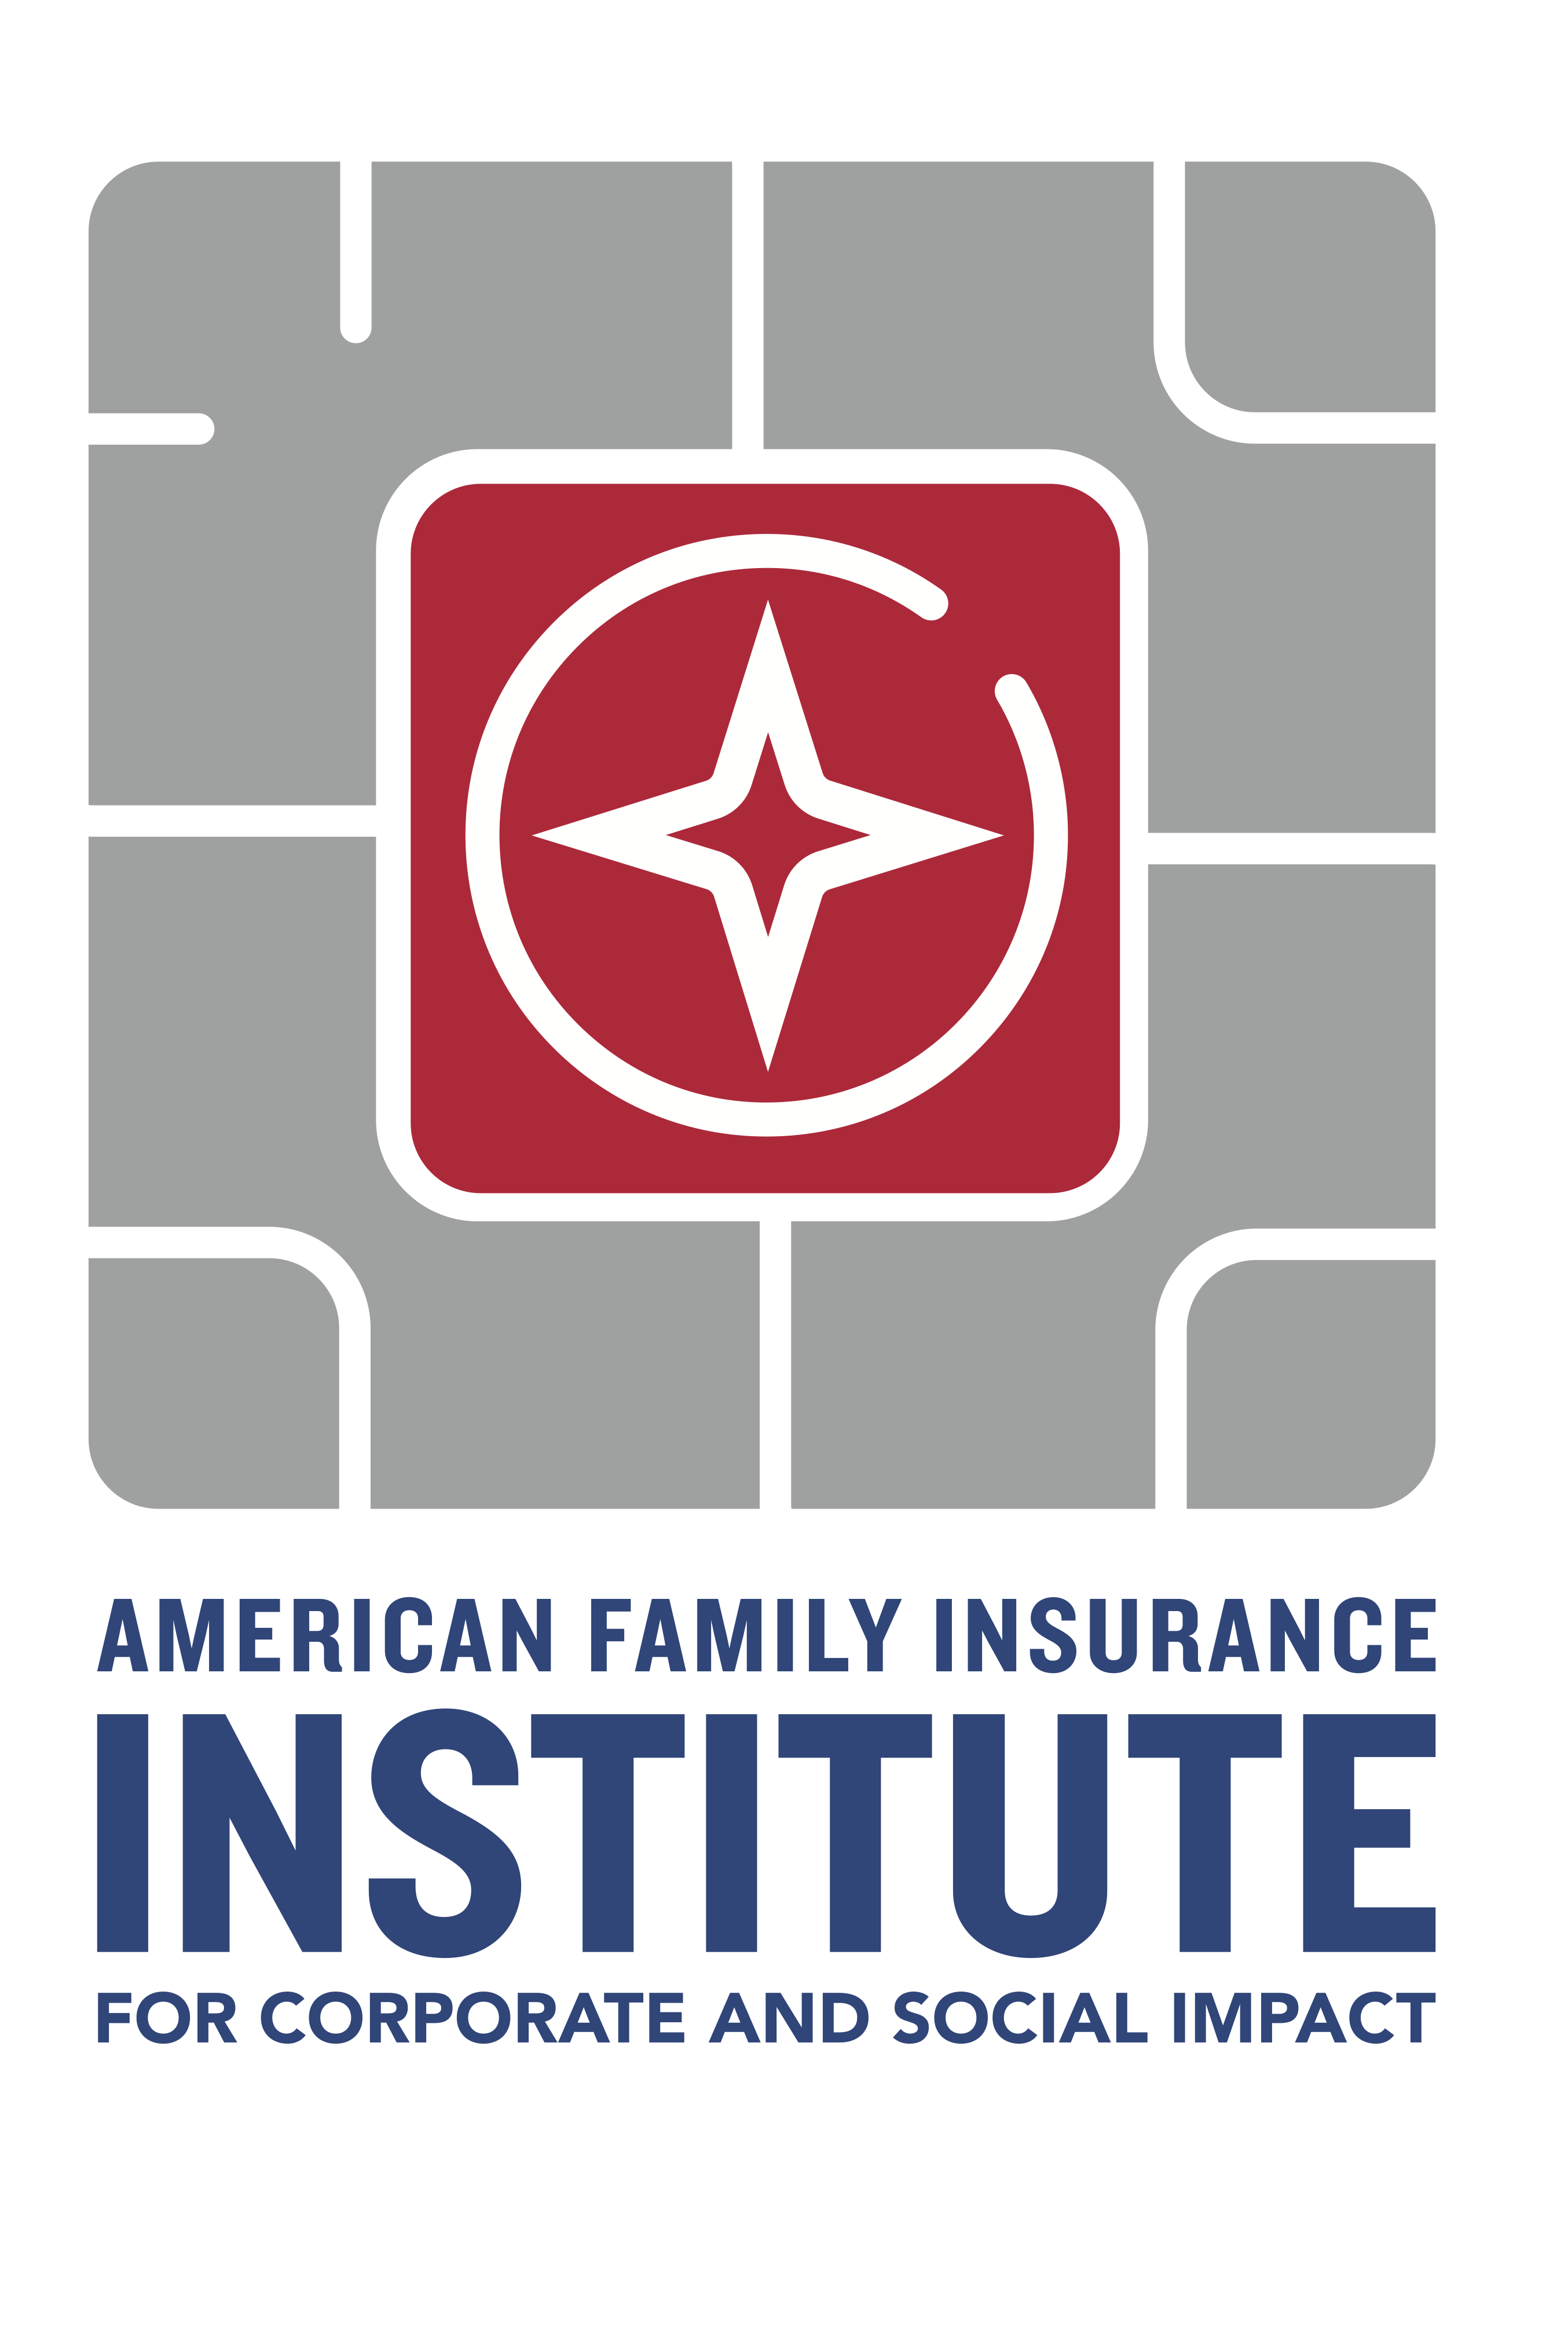 AMERICAN FAMILY INSURANCE INSTITUTE